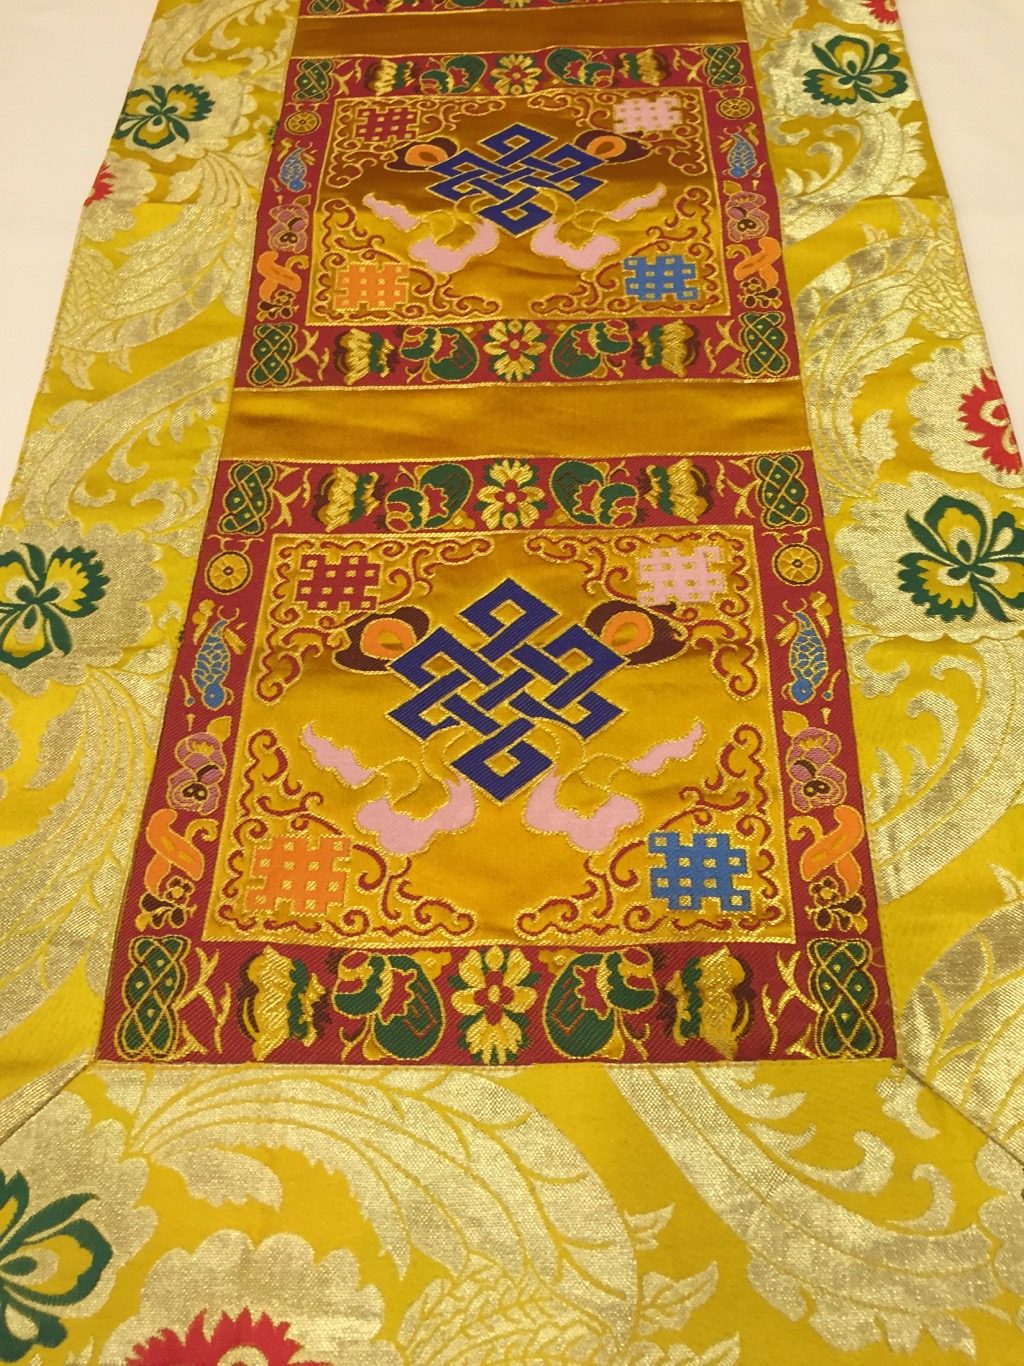 Tibetan Brocade Endless Knot Yellow Table Runner